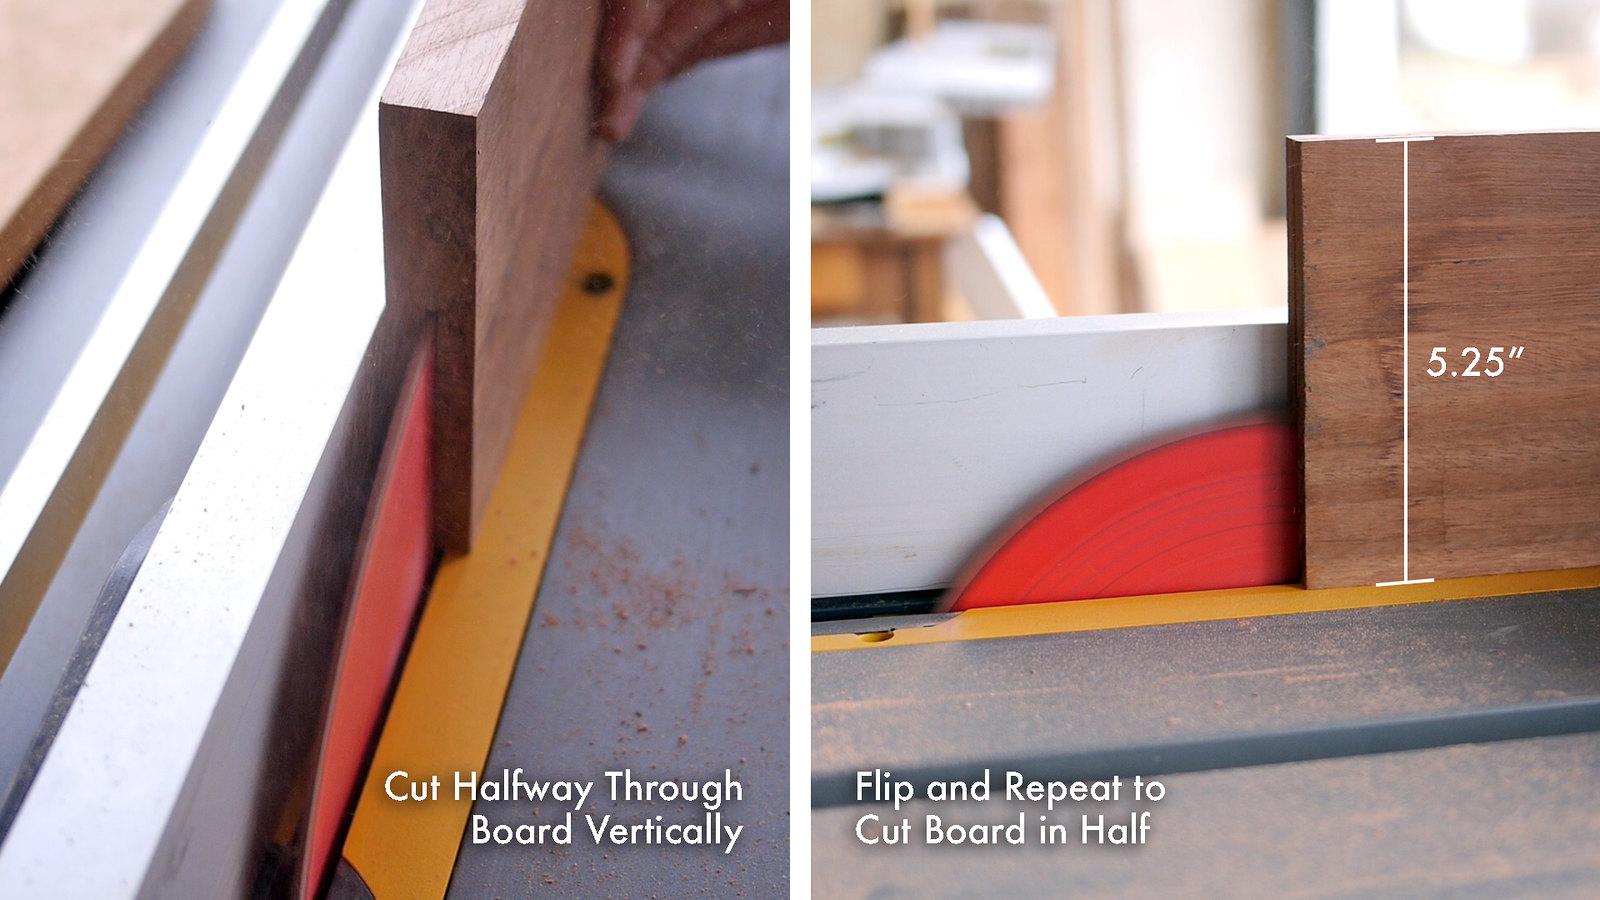 Cut Board in Half